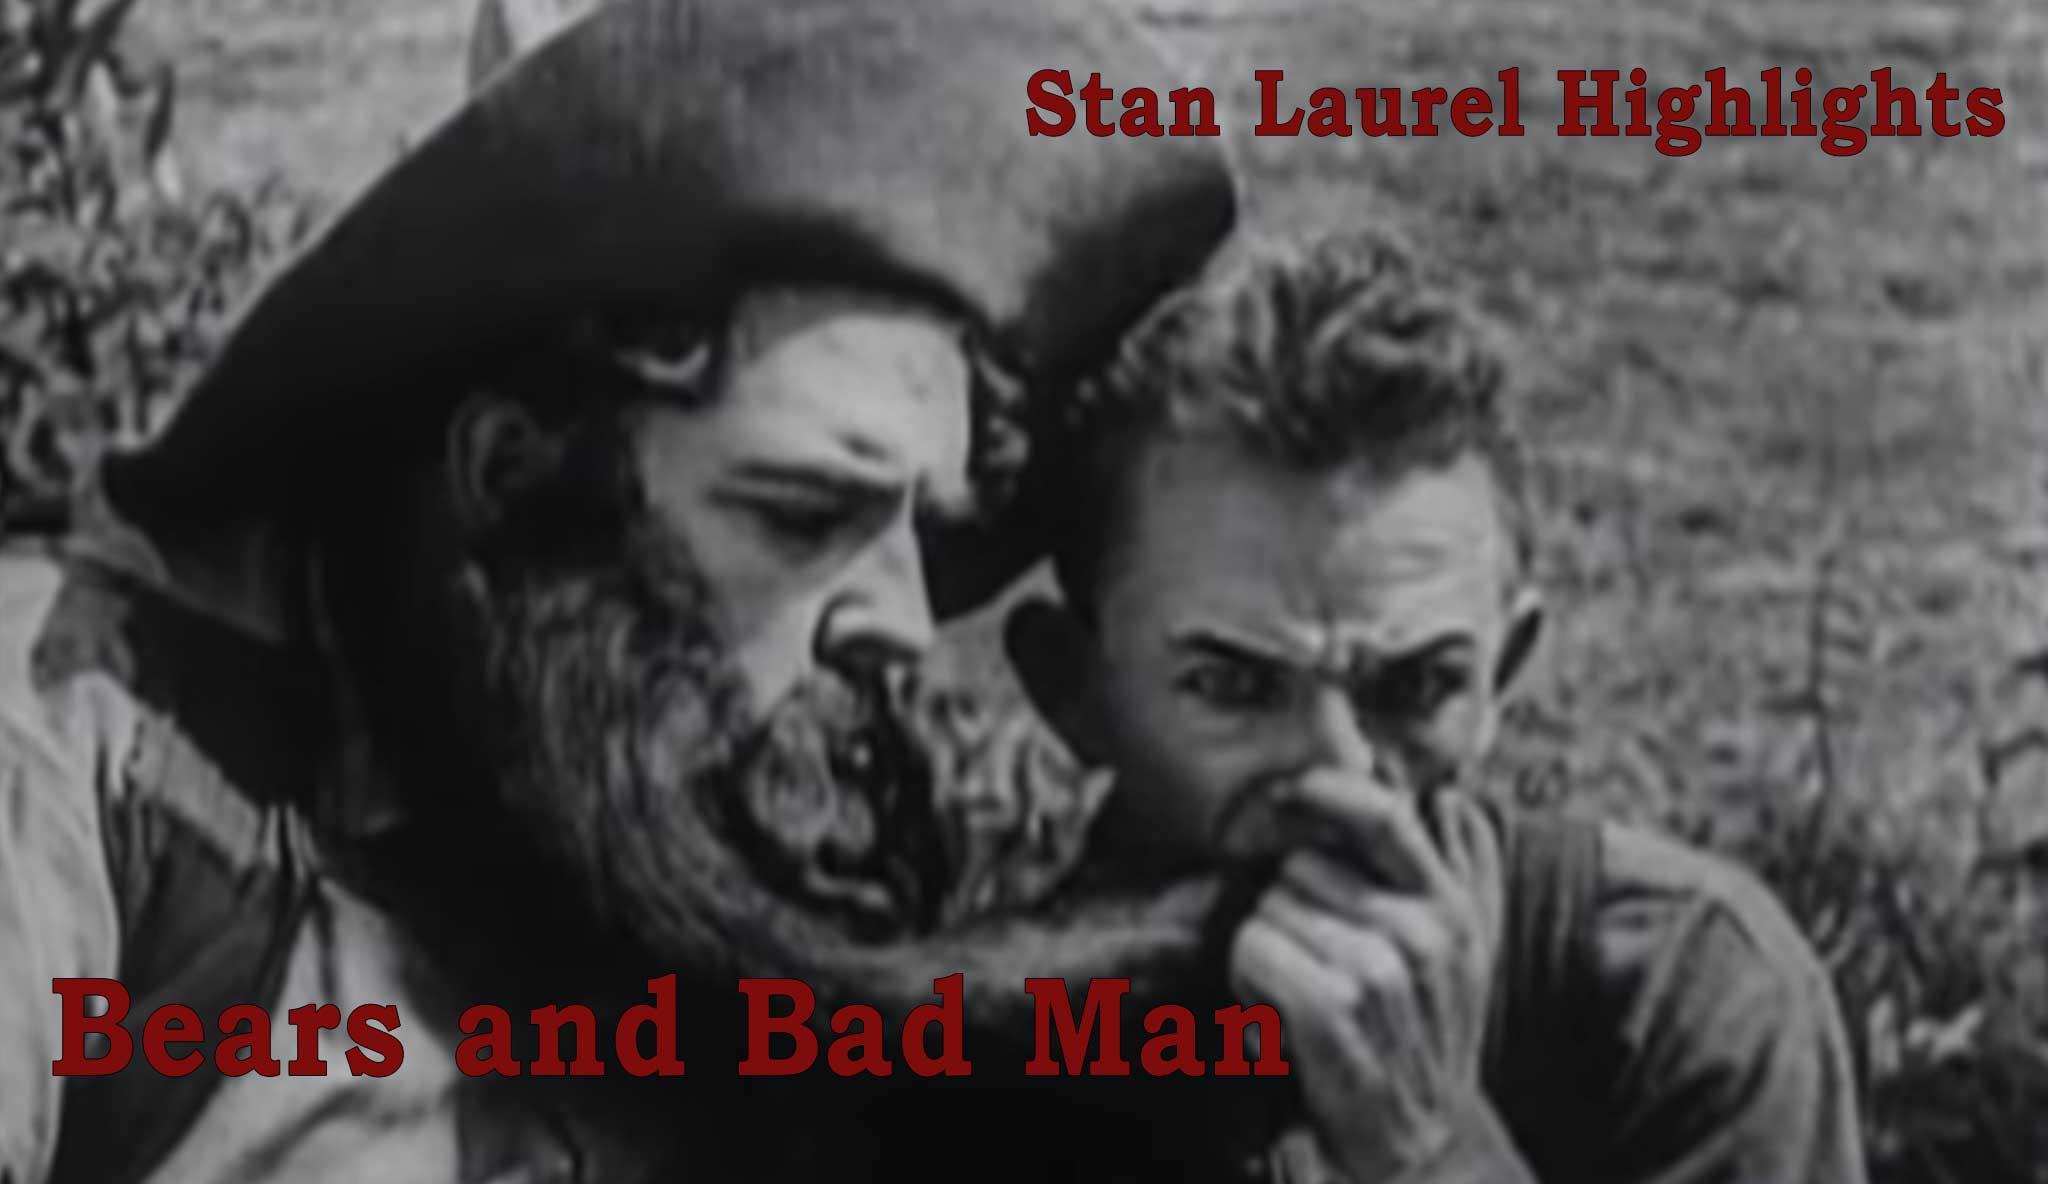 stan-laurel-highlights-bears-and-bad-man\header.jpg